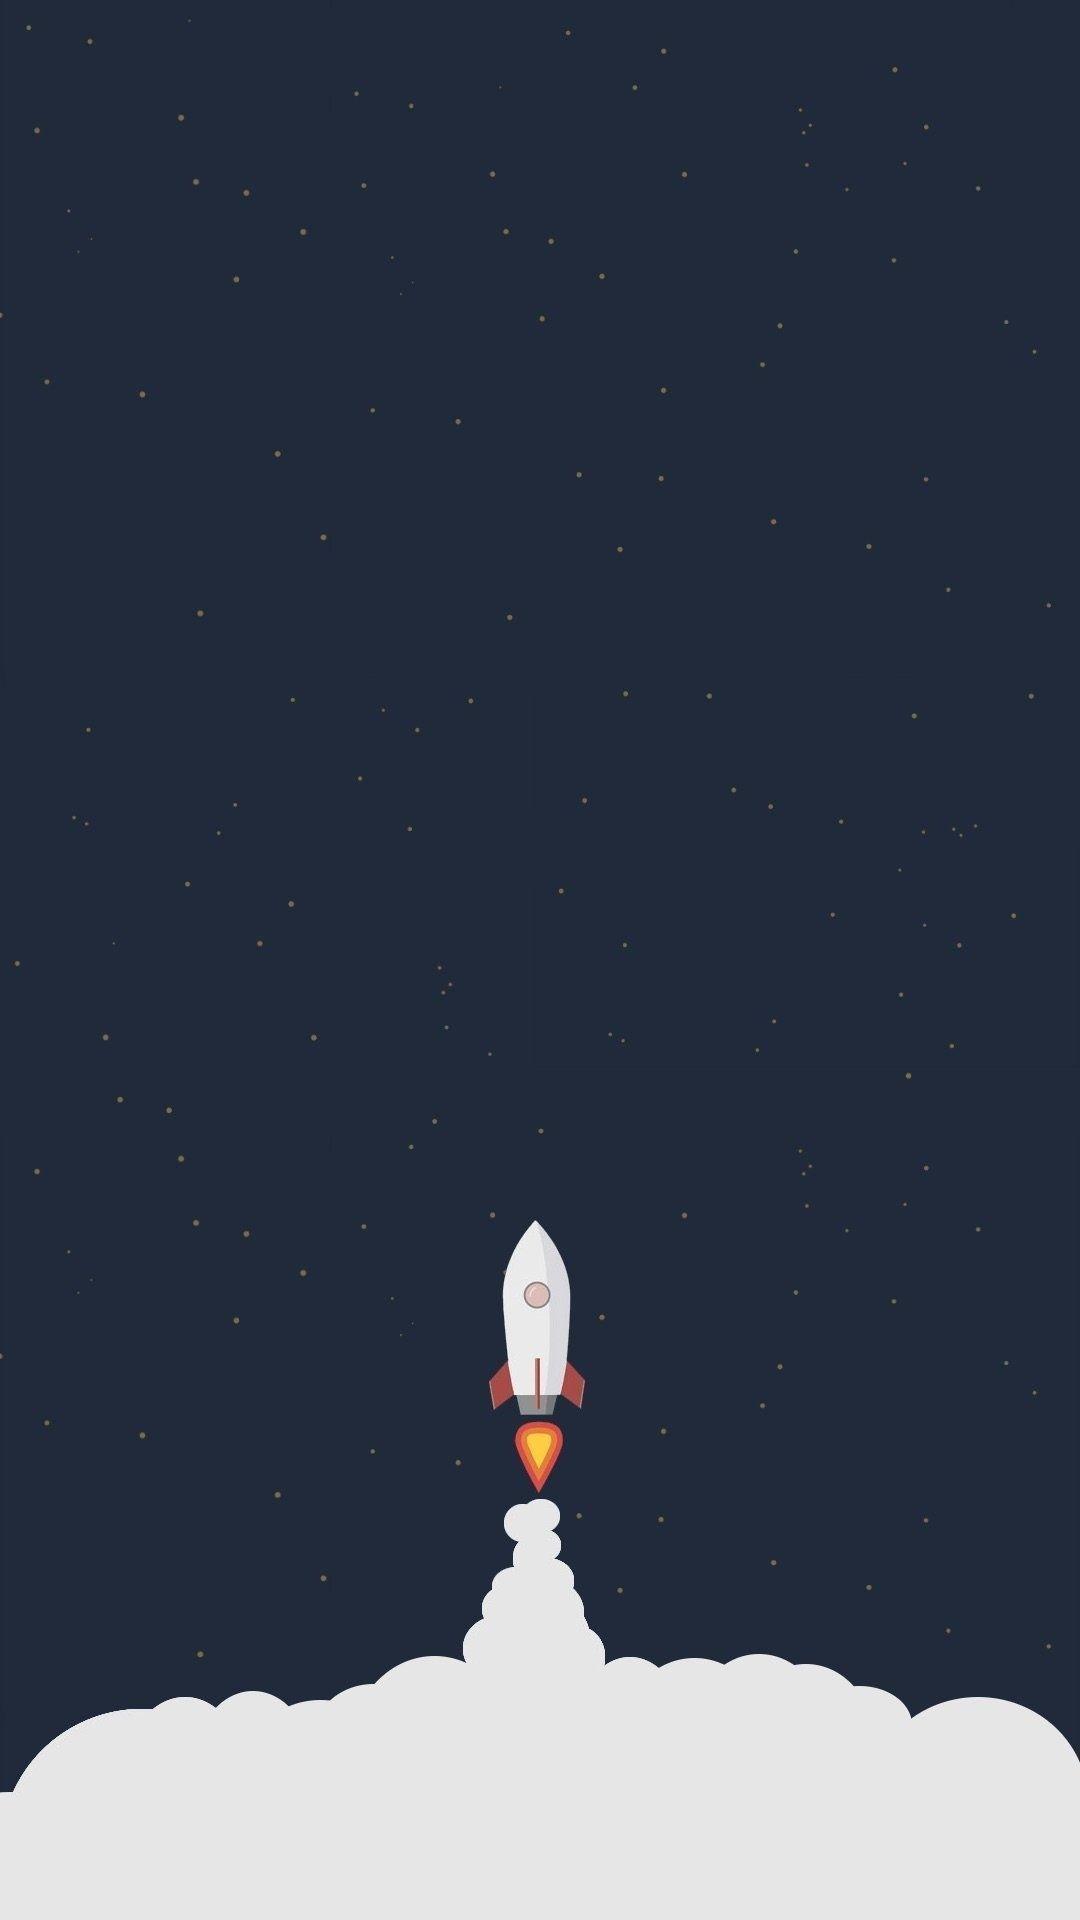 Logic iPhone 5 wallpaper